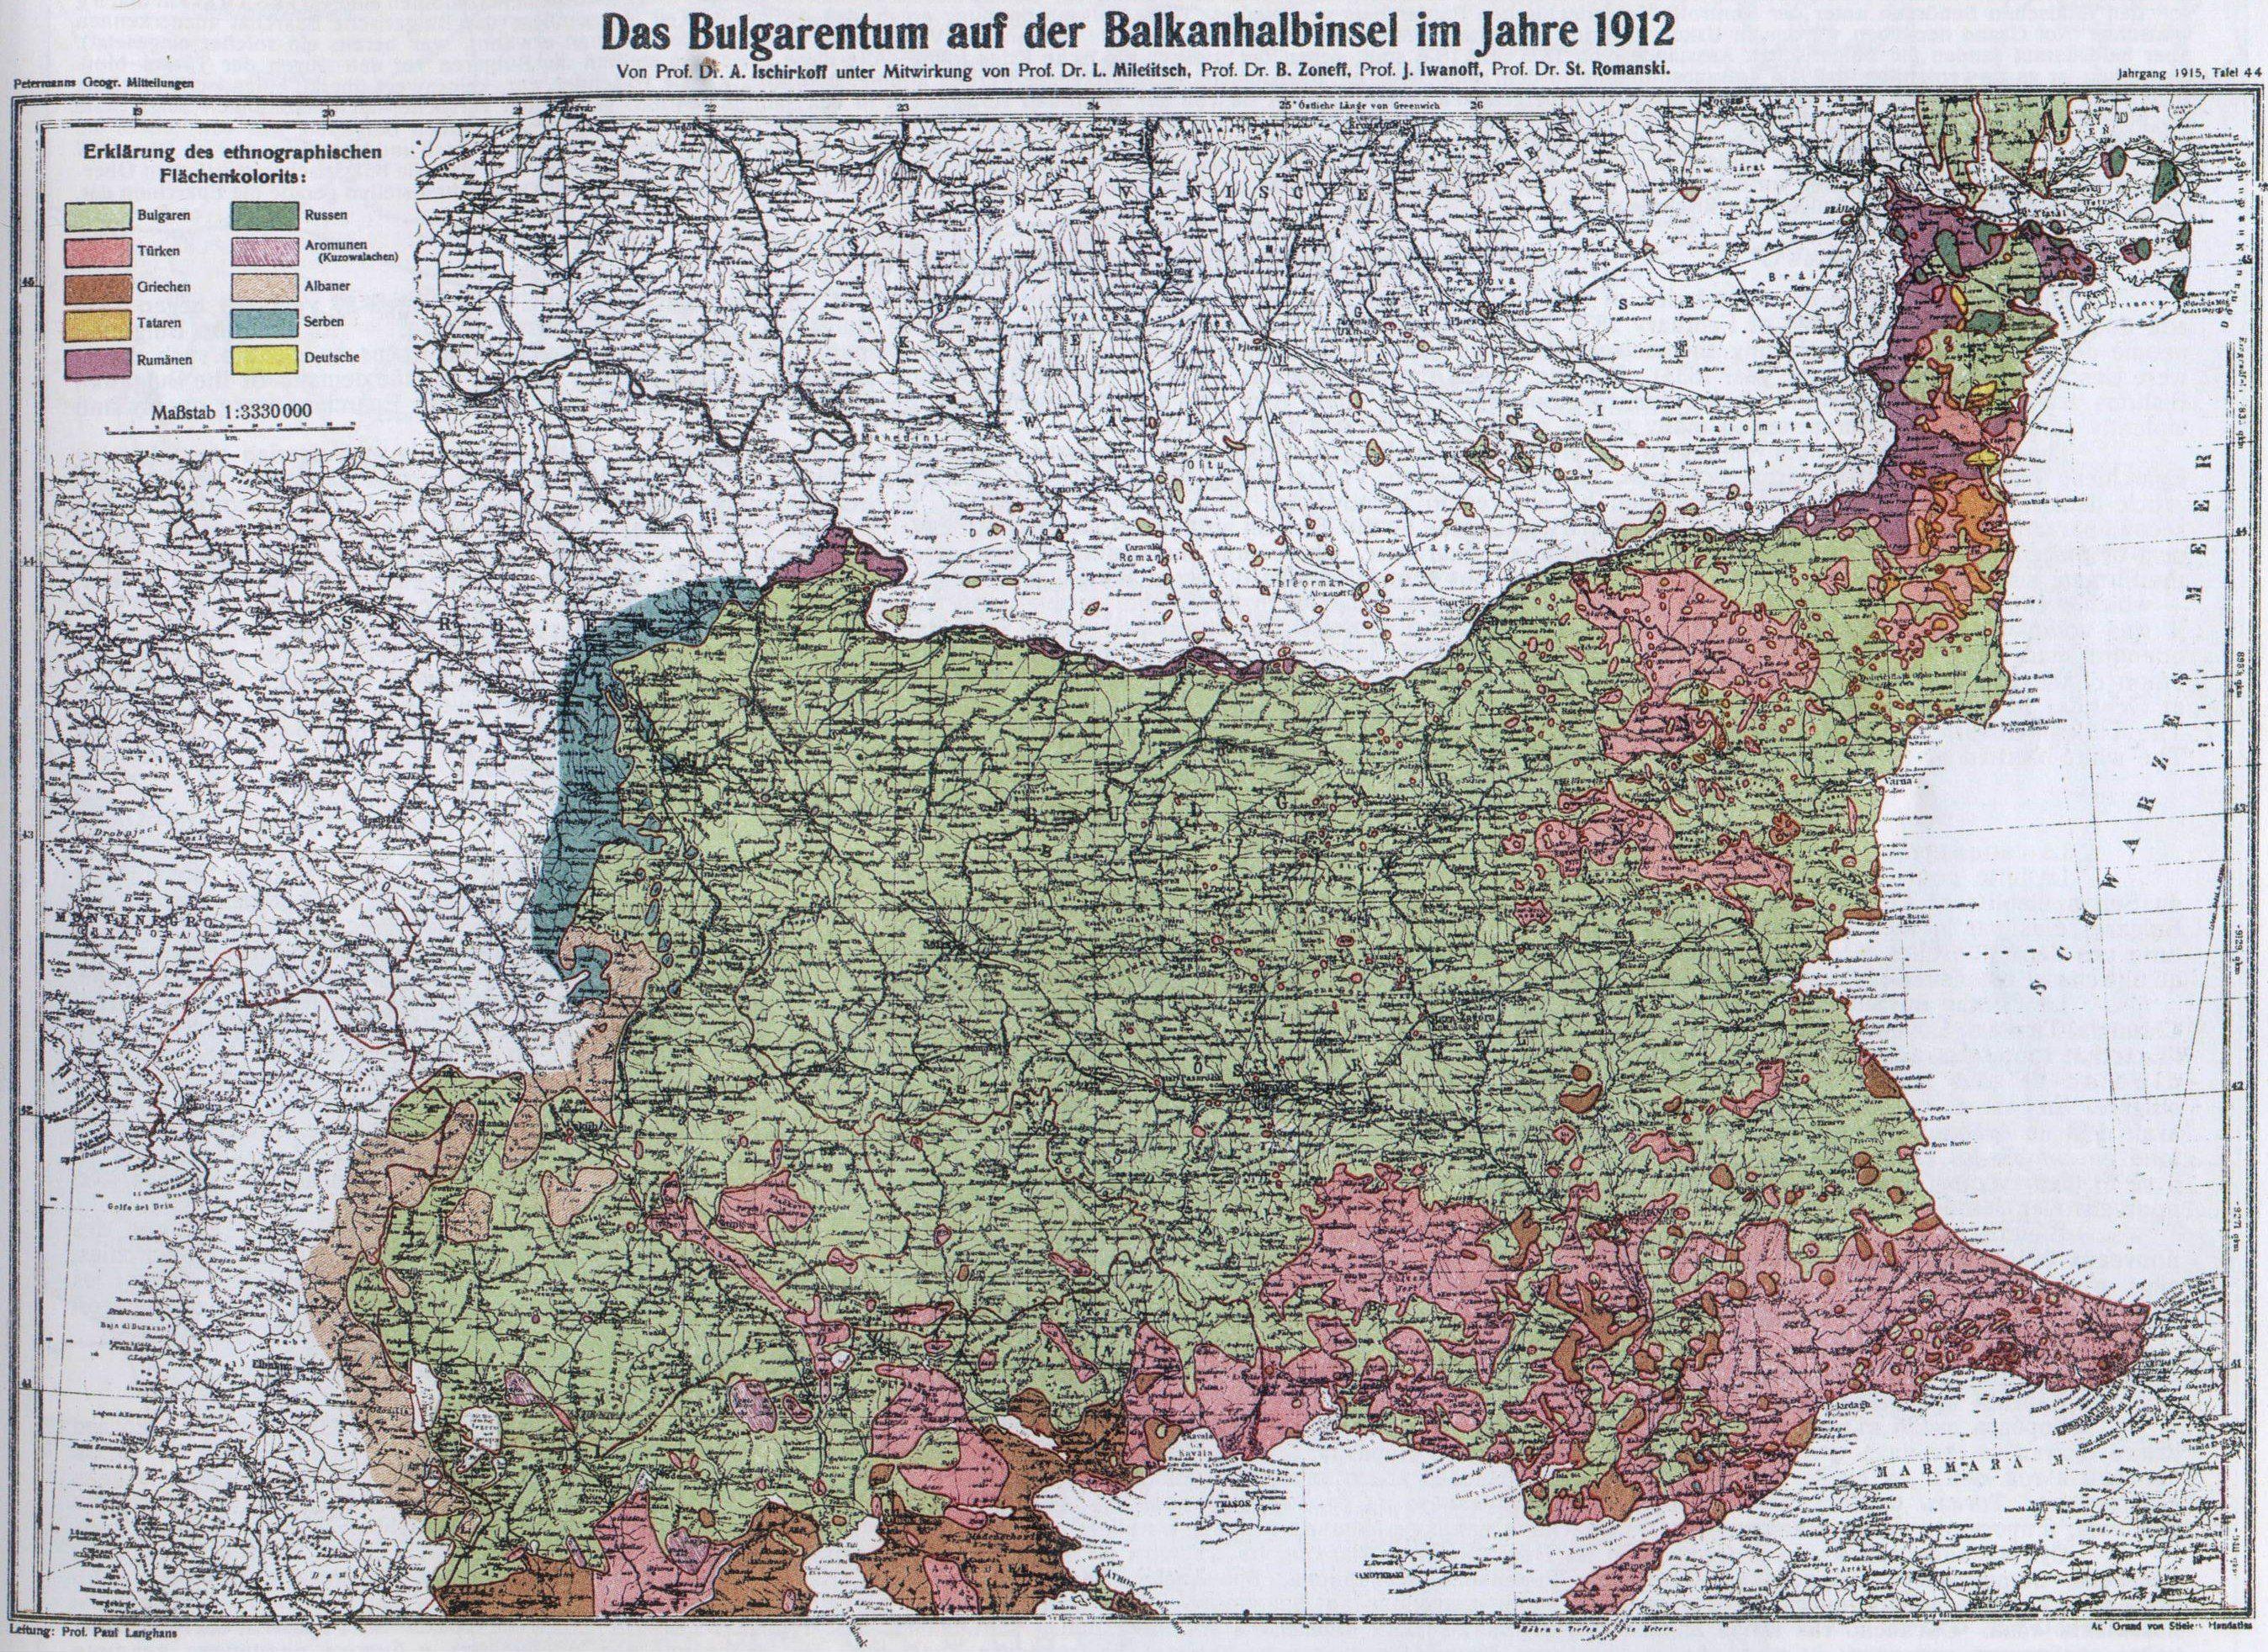 Ethnographic map of Bulgaria 1912 Ethnographic map